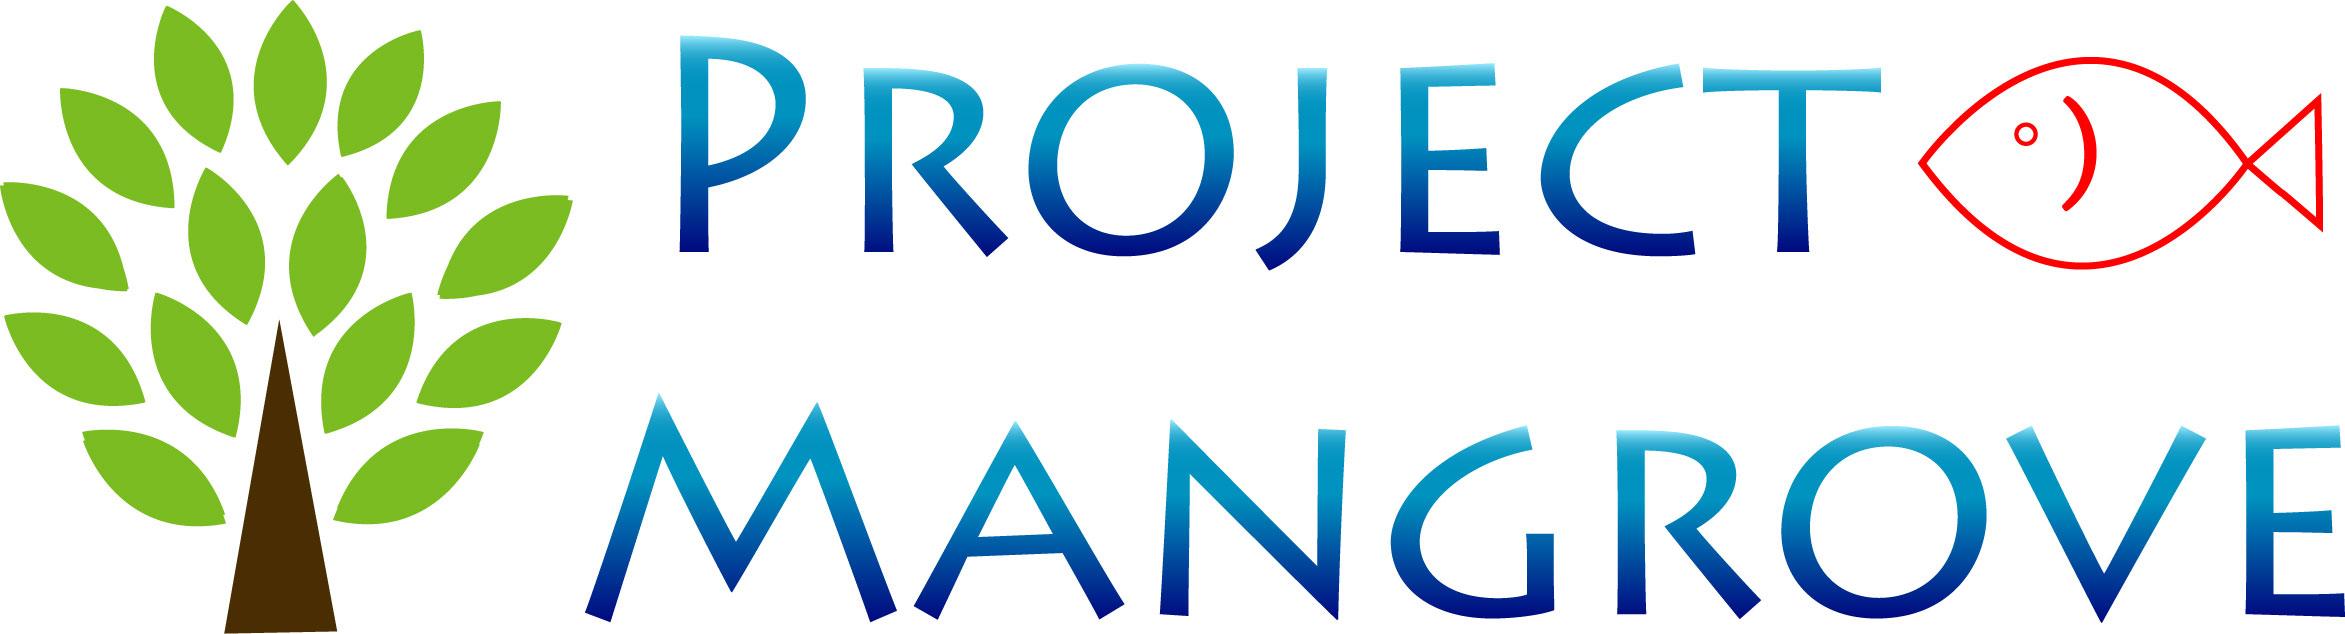 project_mangrove_logo.jpg